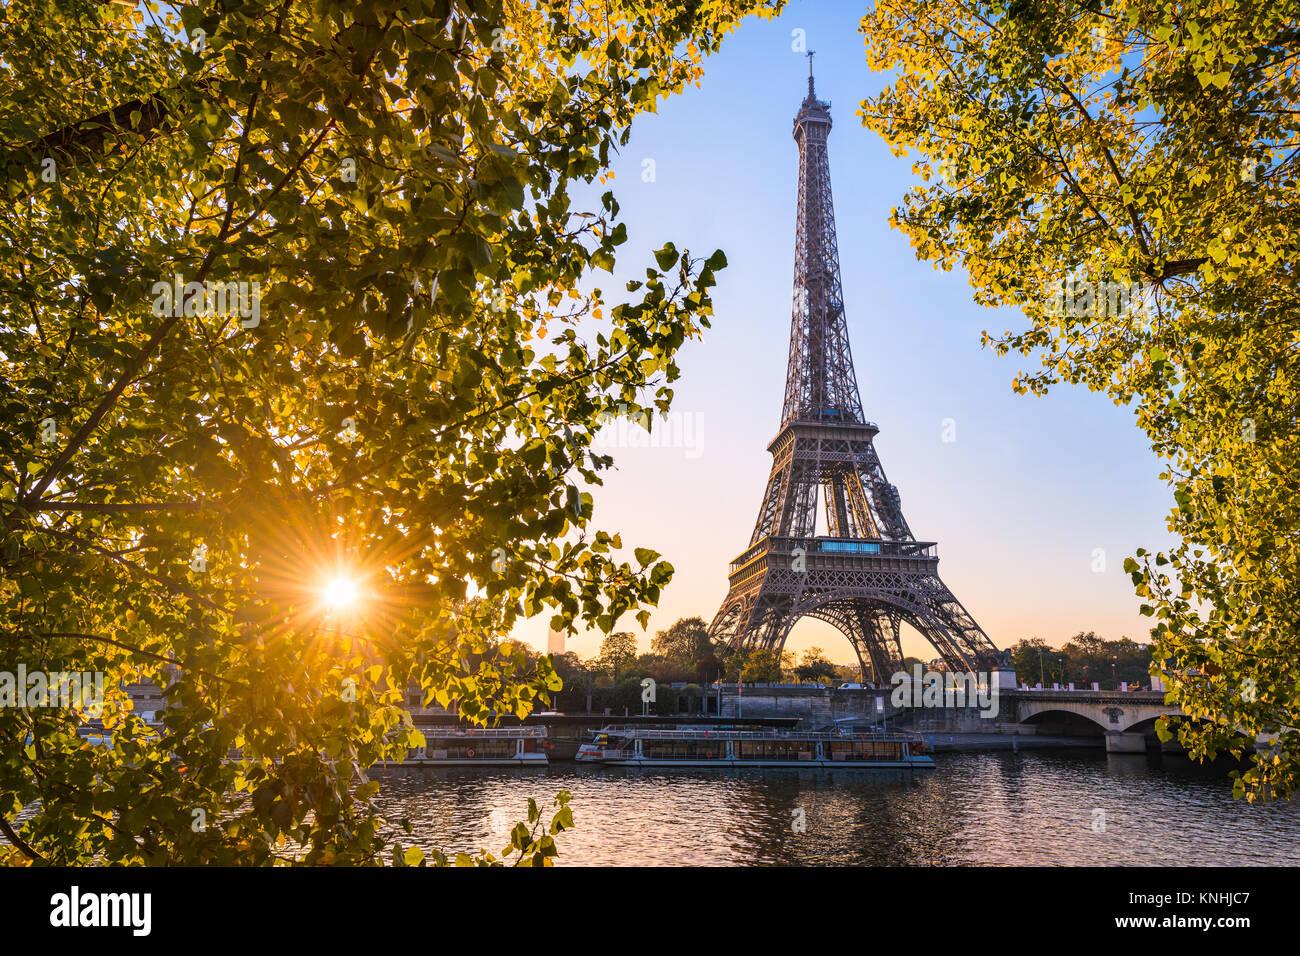 Sunrise at the Eiffel tower during autumn, Paris - Stock Image